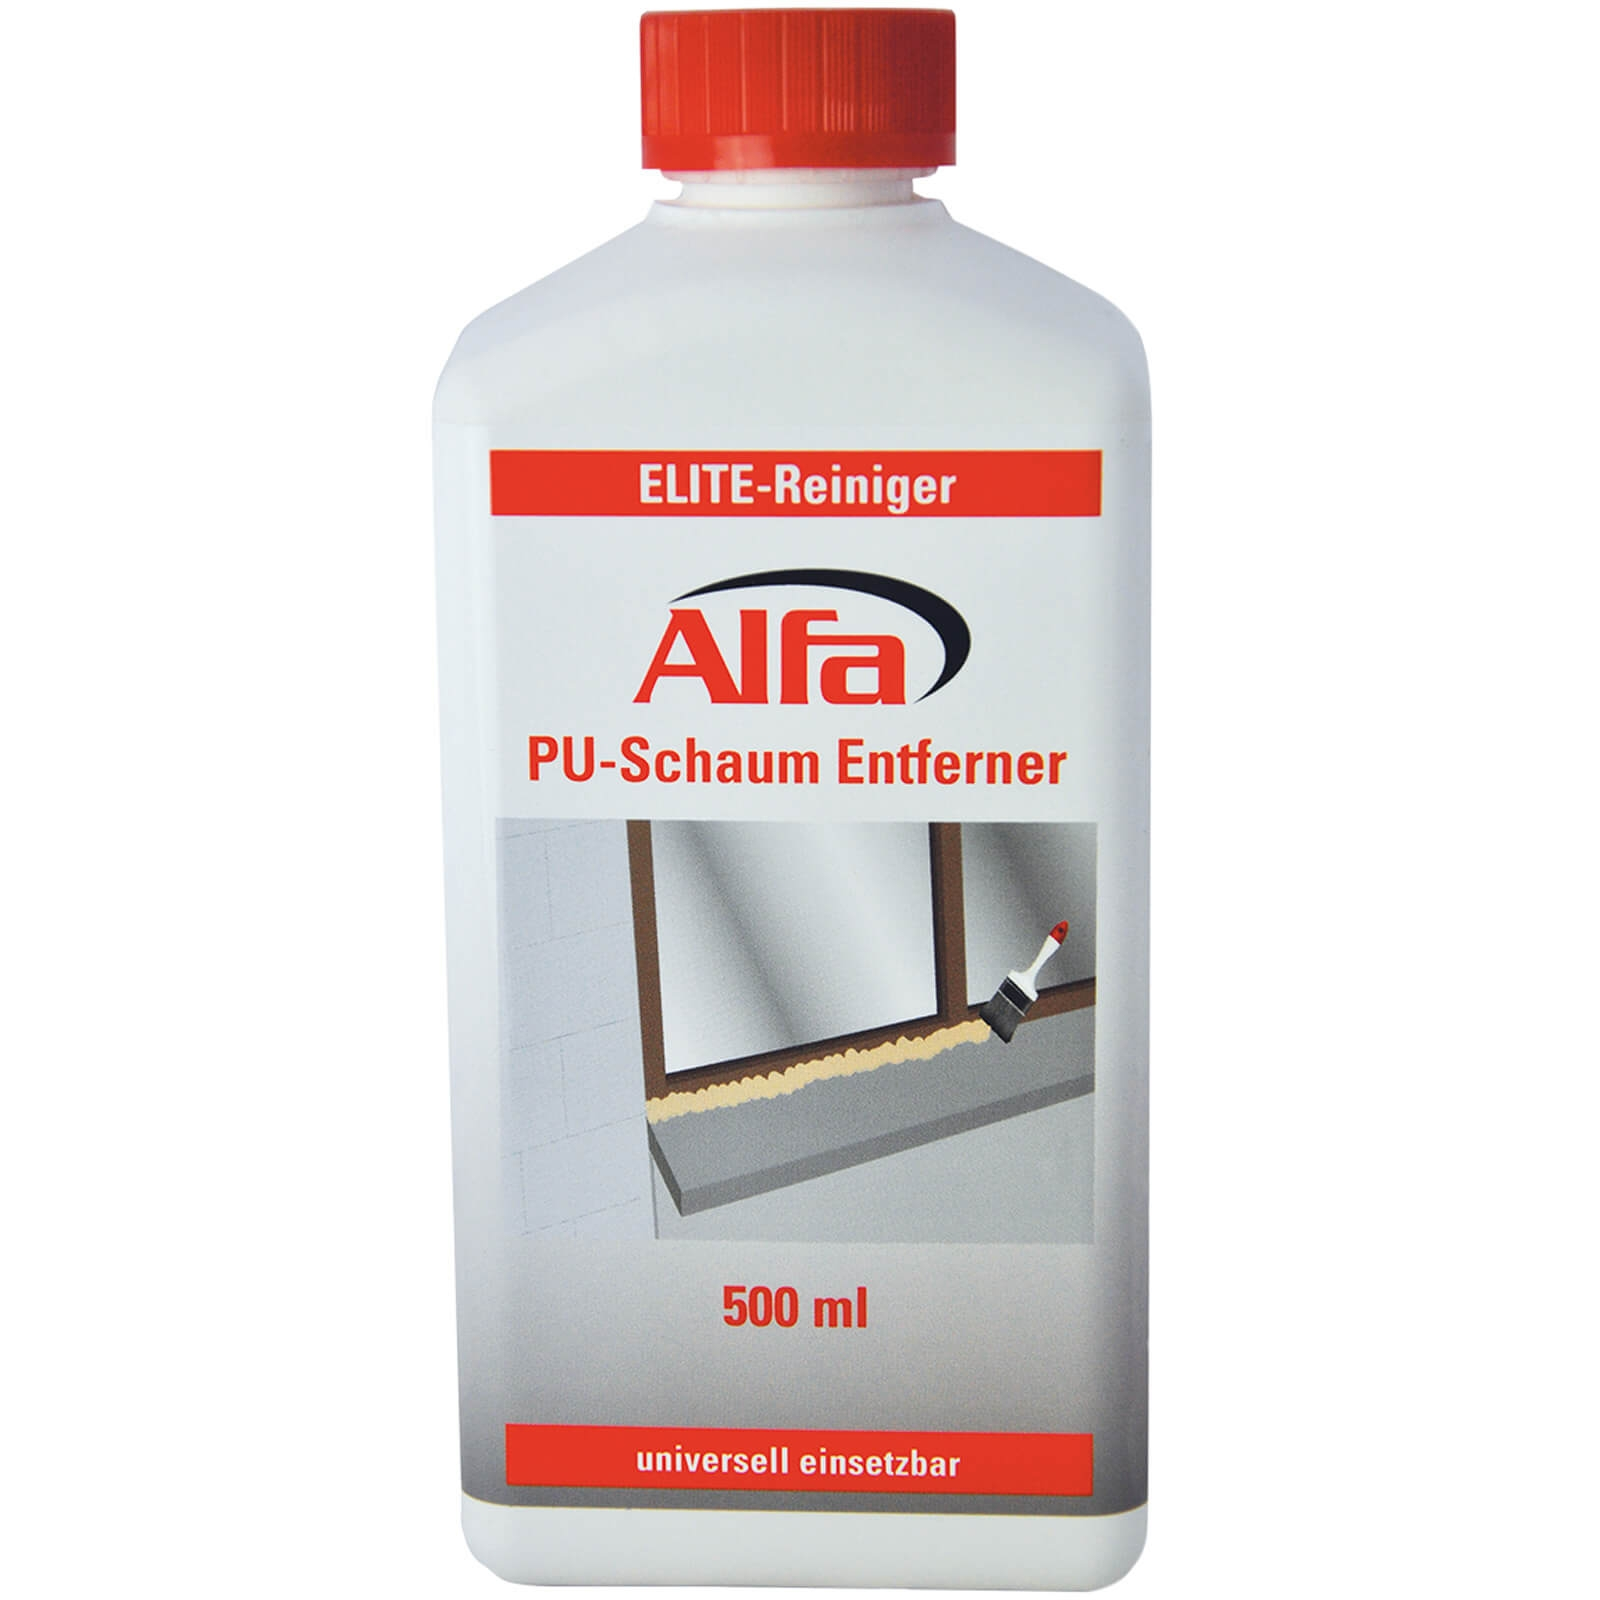 alfa pu-schaum-entferner